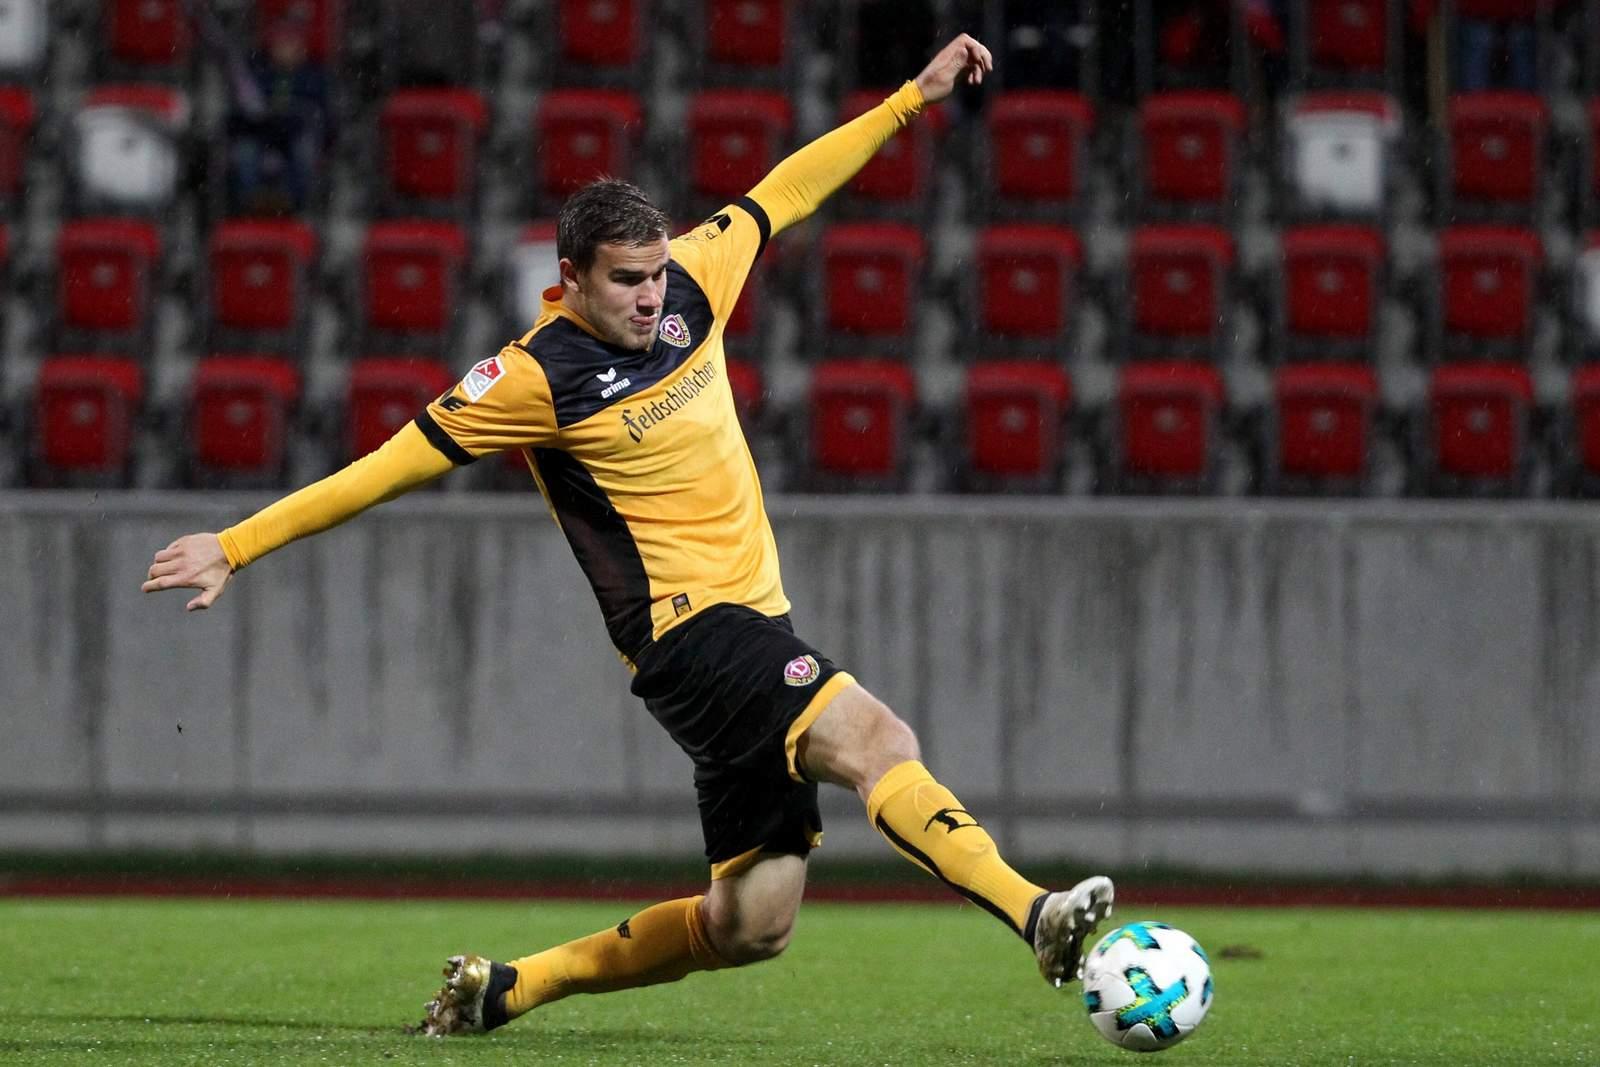 Eero Markkanen im Testspiel gegen Rot Weiß Erfurt